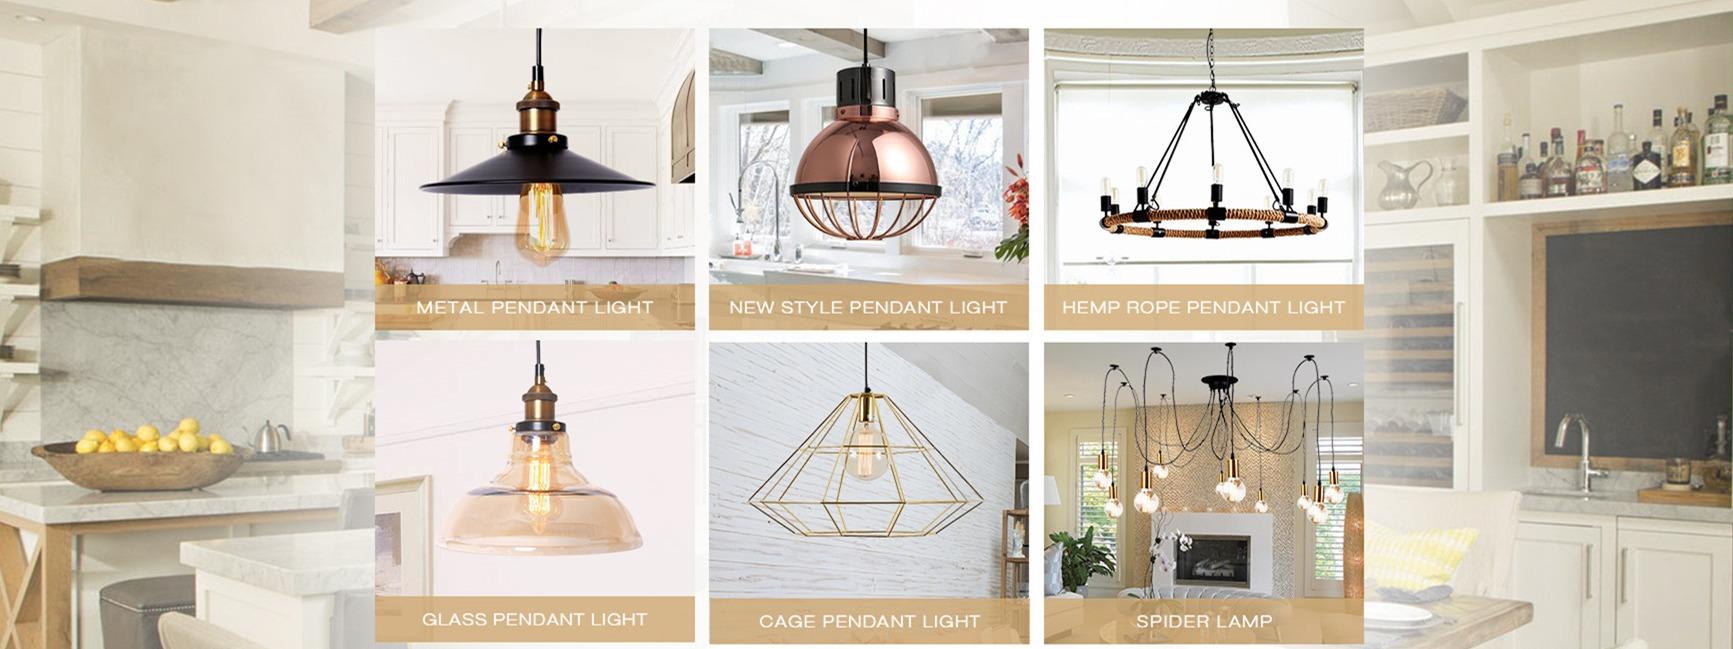 Jinsanye Import Export Fuzhou Co Ltd Pendant Light Wall Lamp